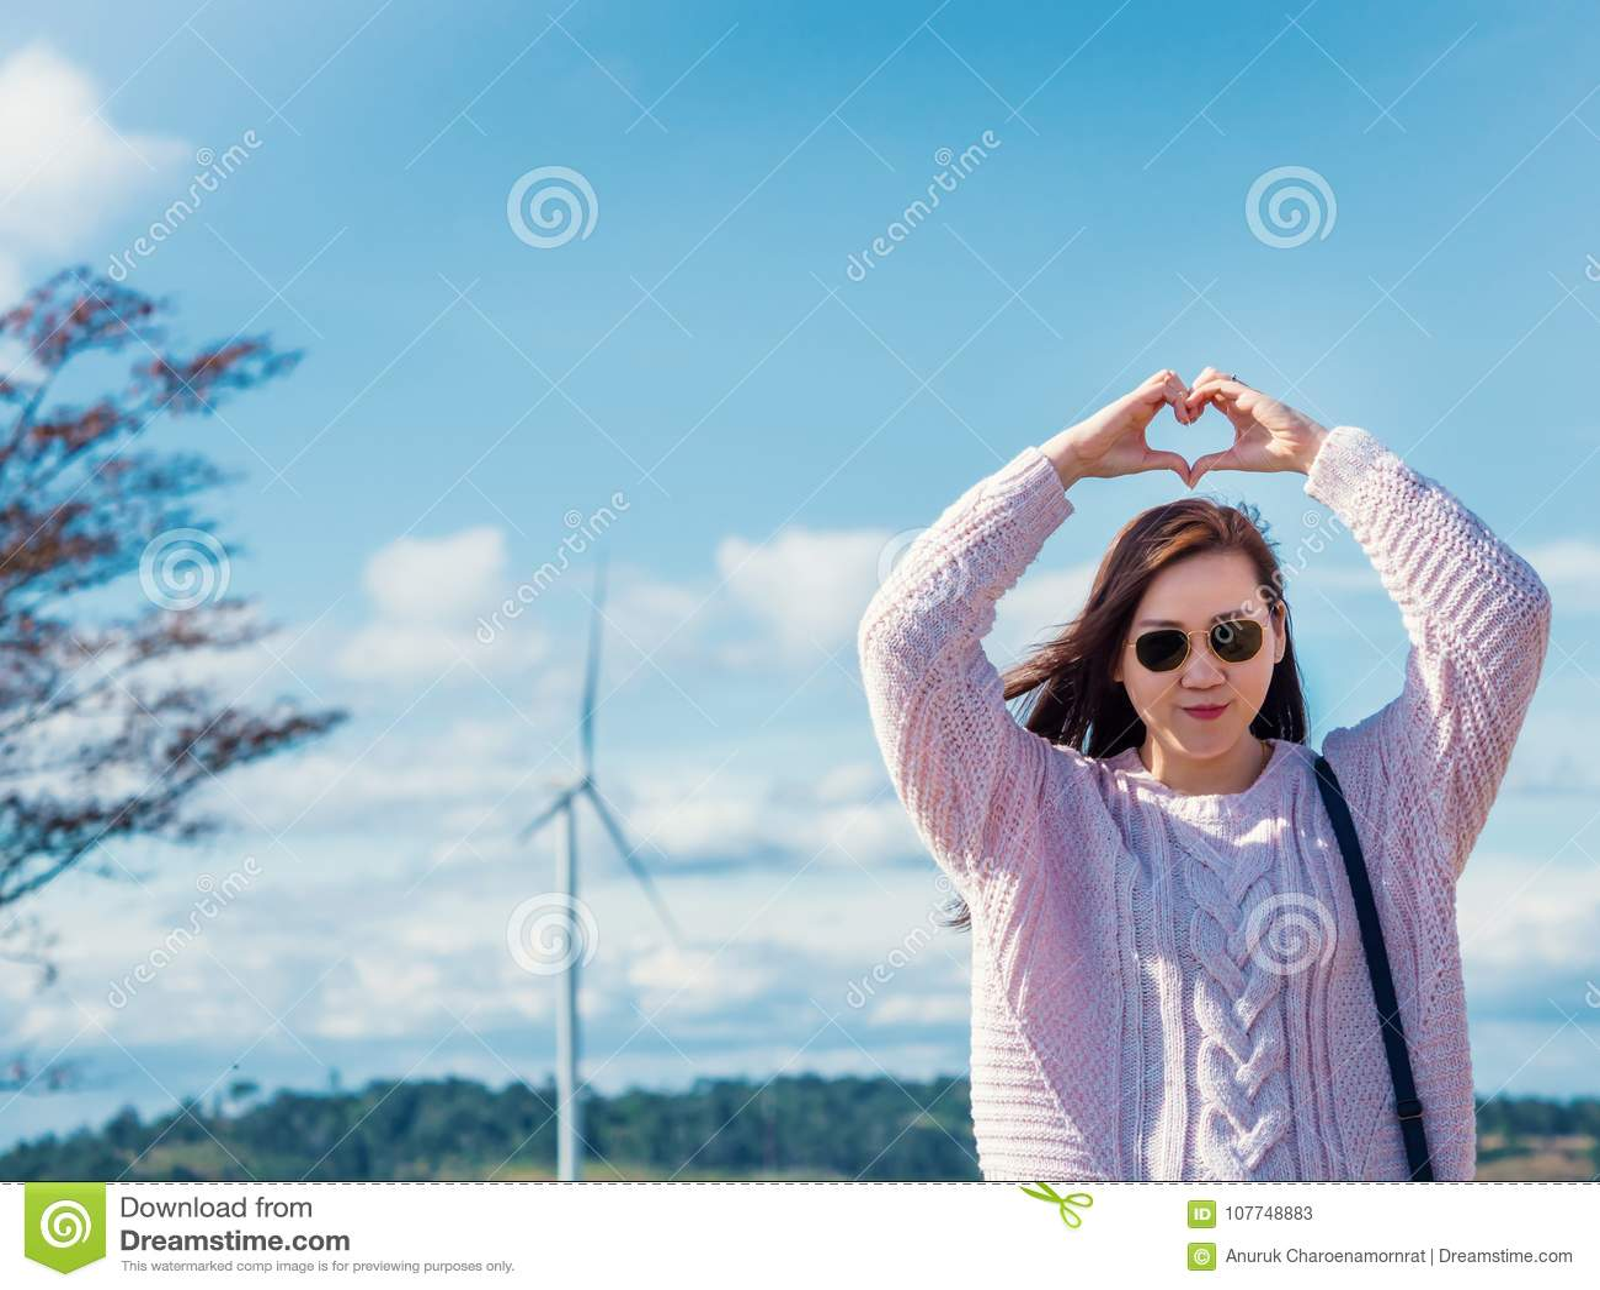 asian woman dating